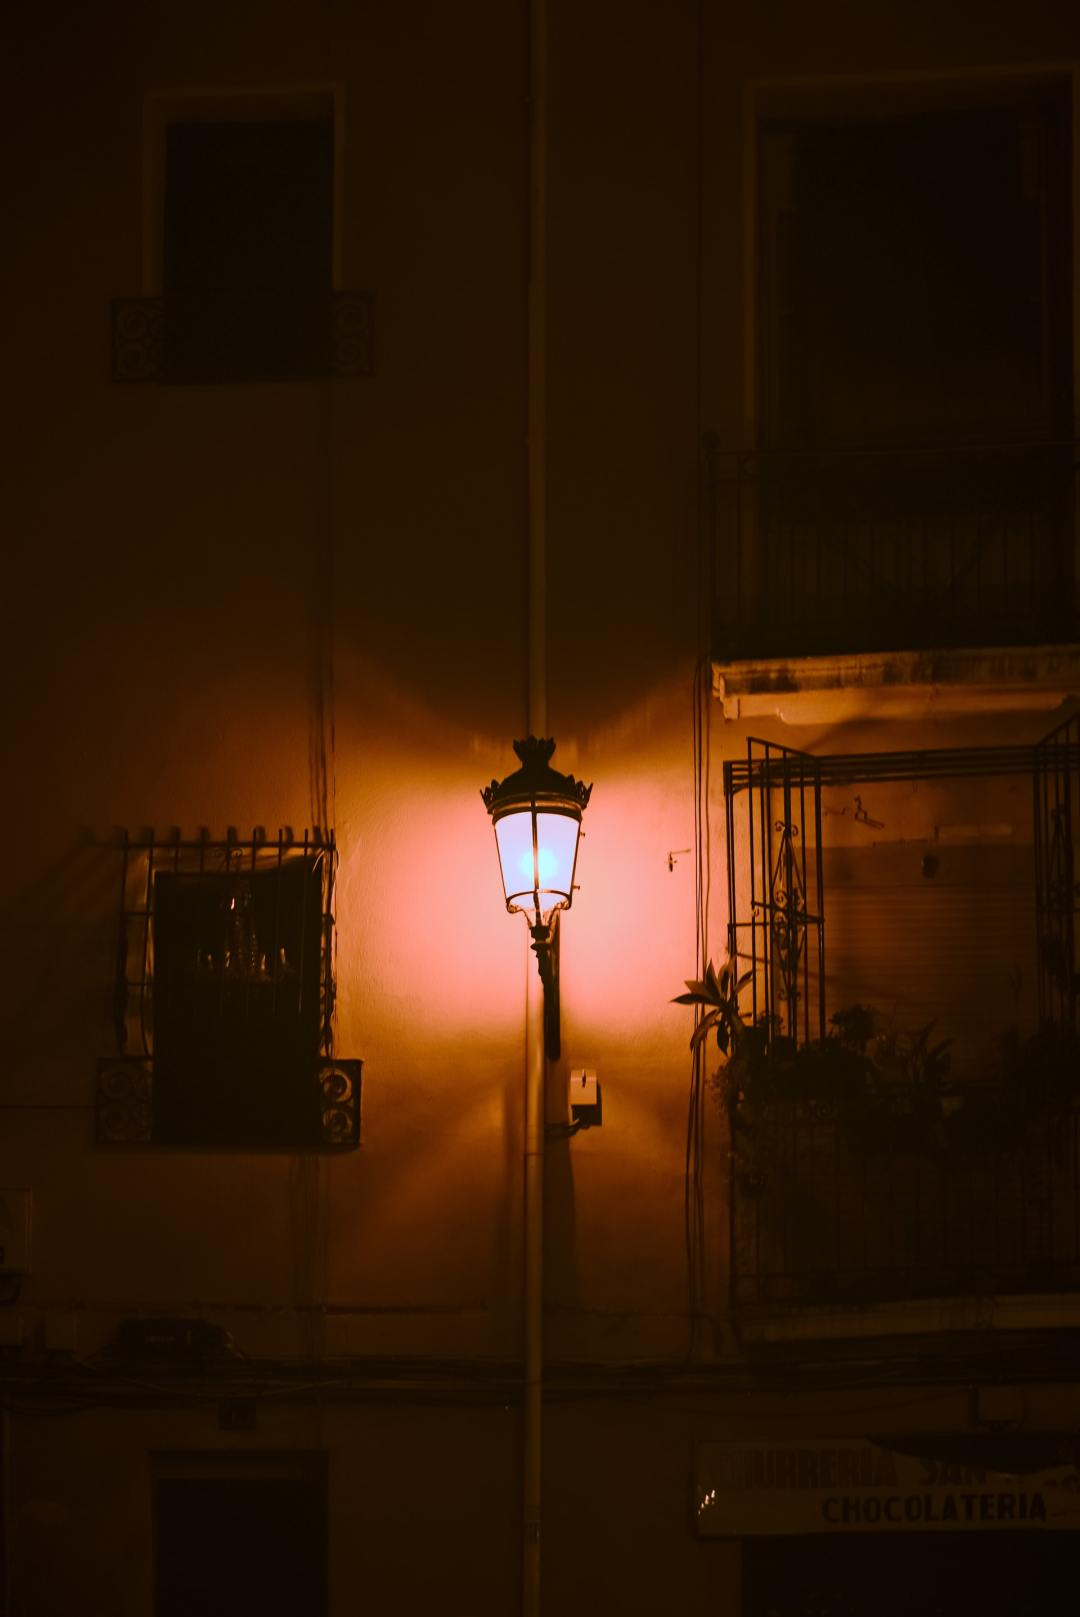 outdoor garage light